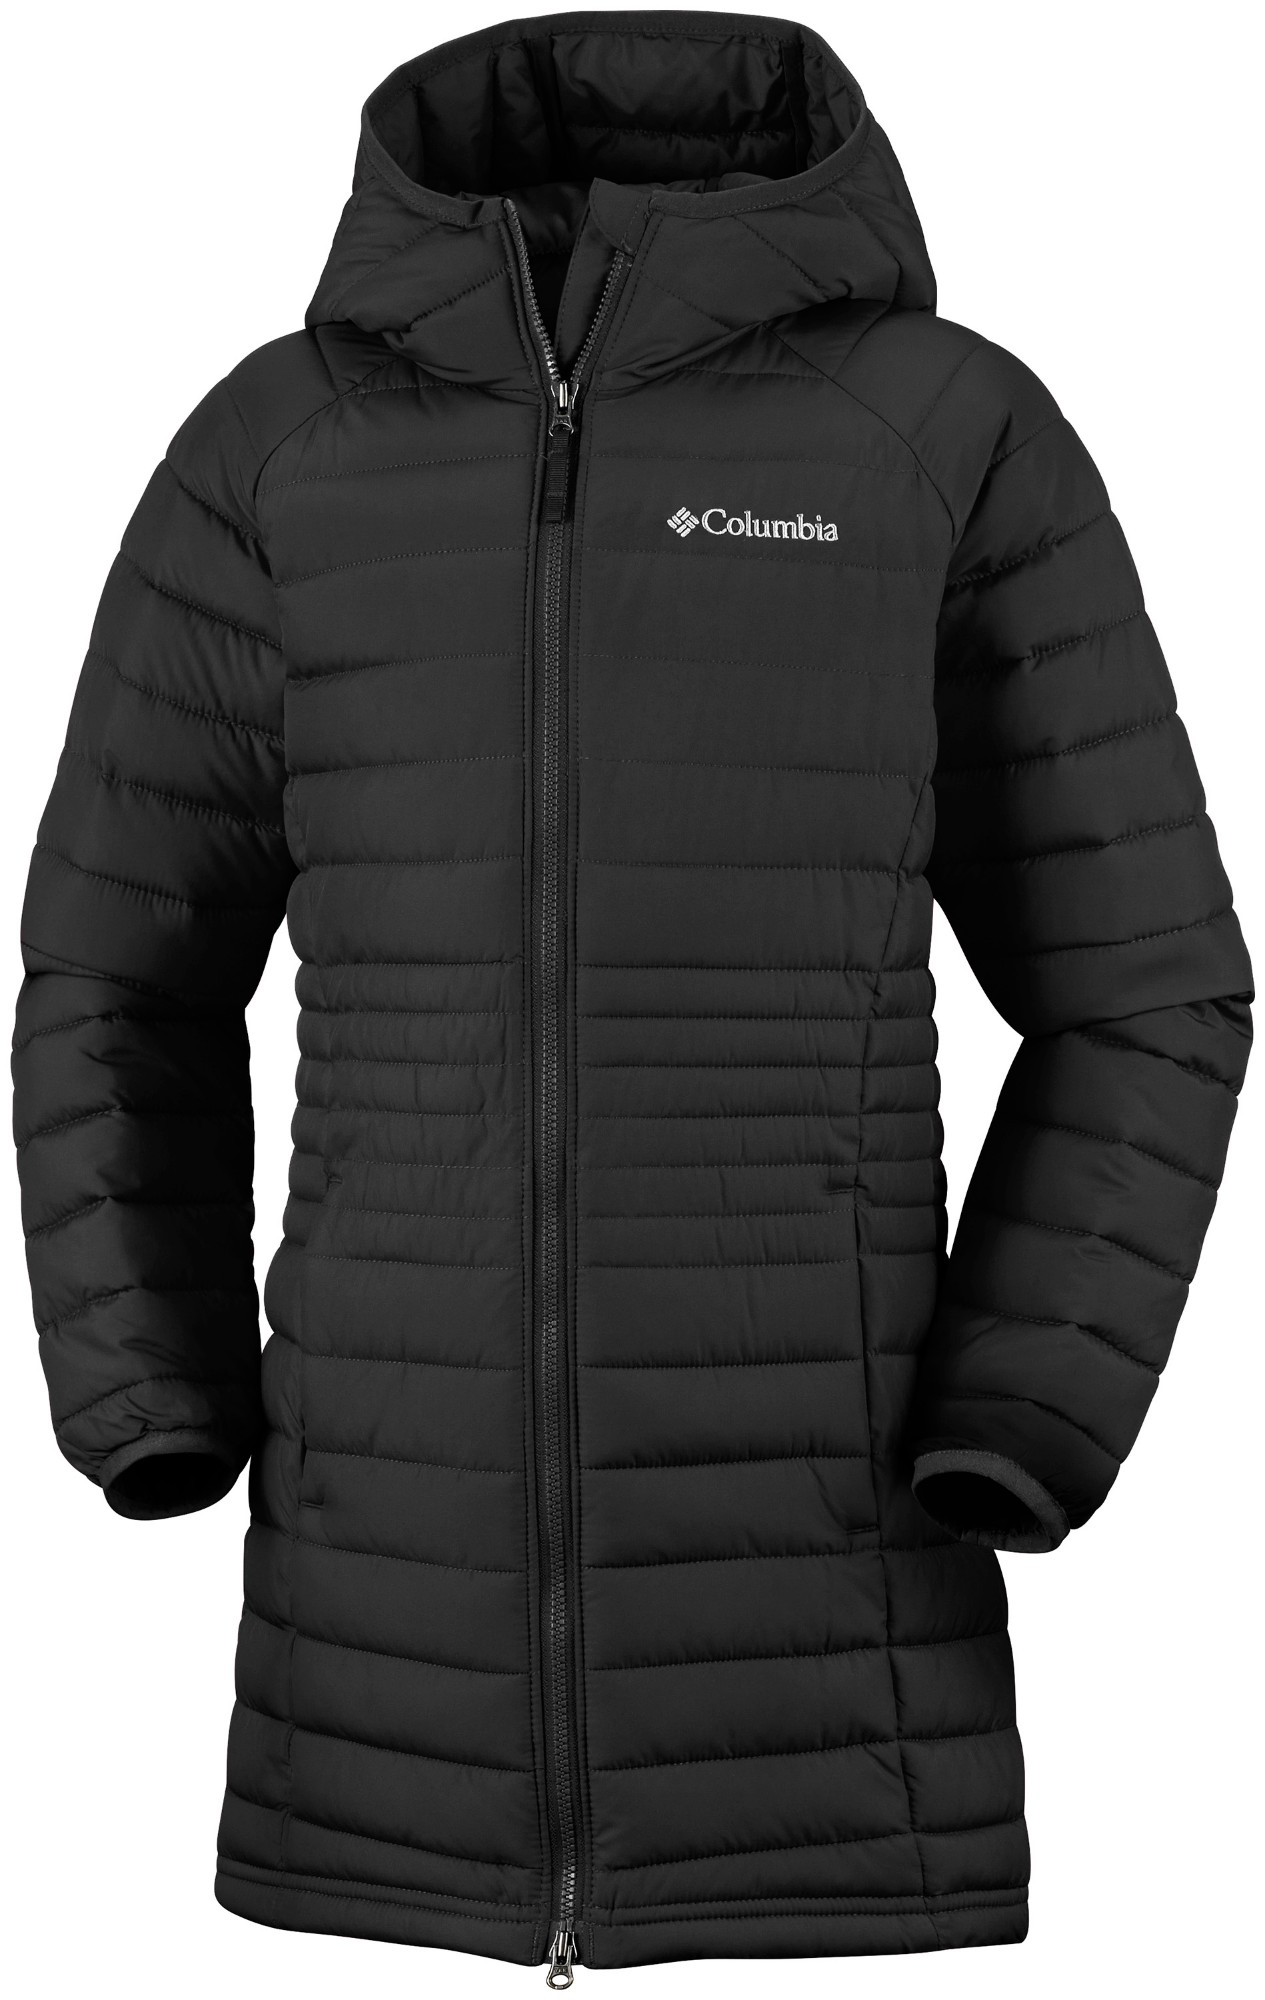 Columbia Powder Lite Girls Mid Jacket Black 164